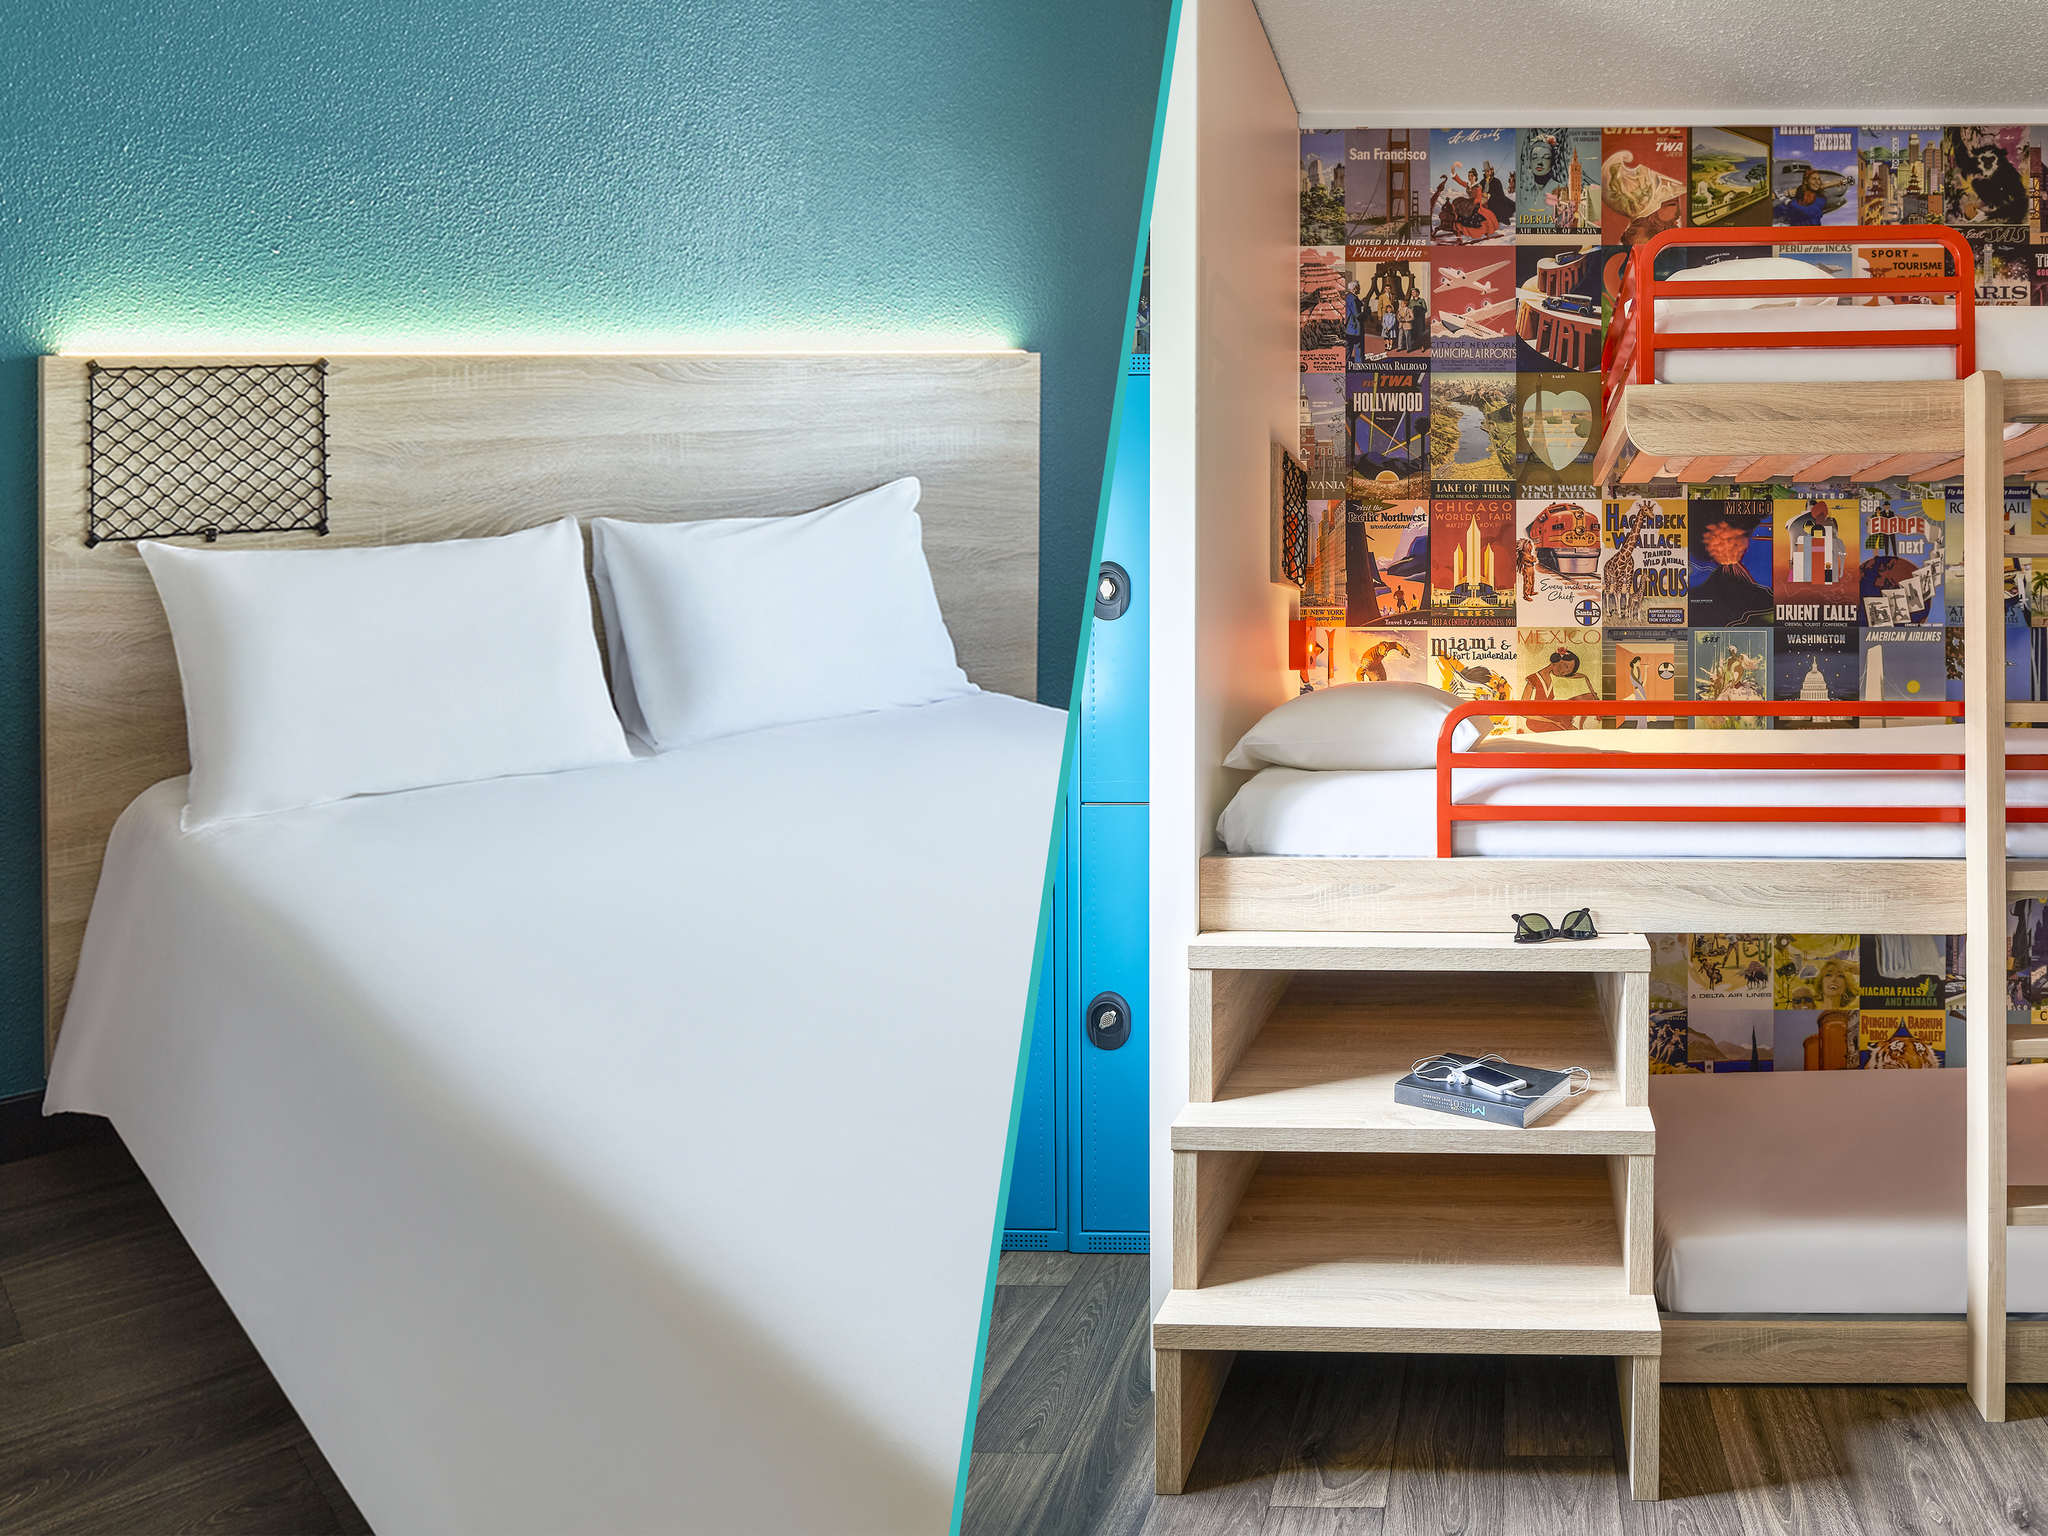 Hotel – hotelF1 Paris Porte de Montmartre